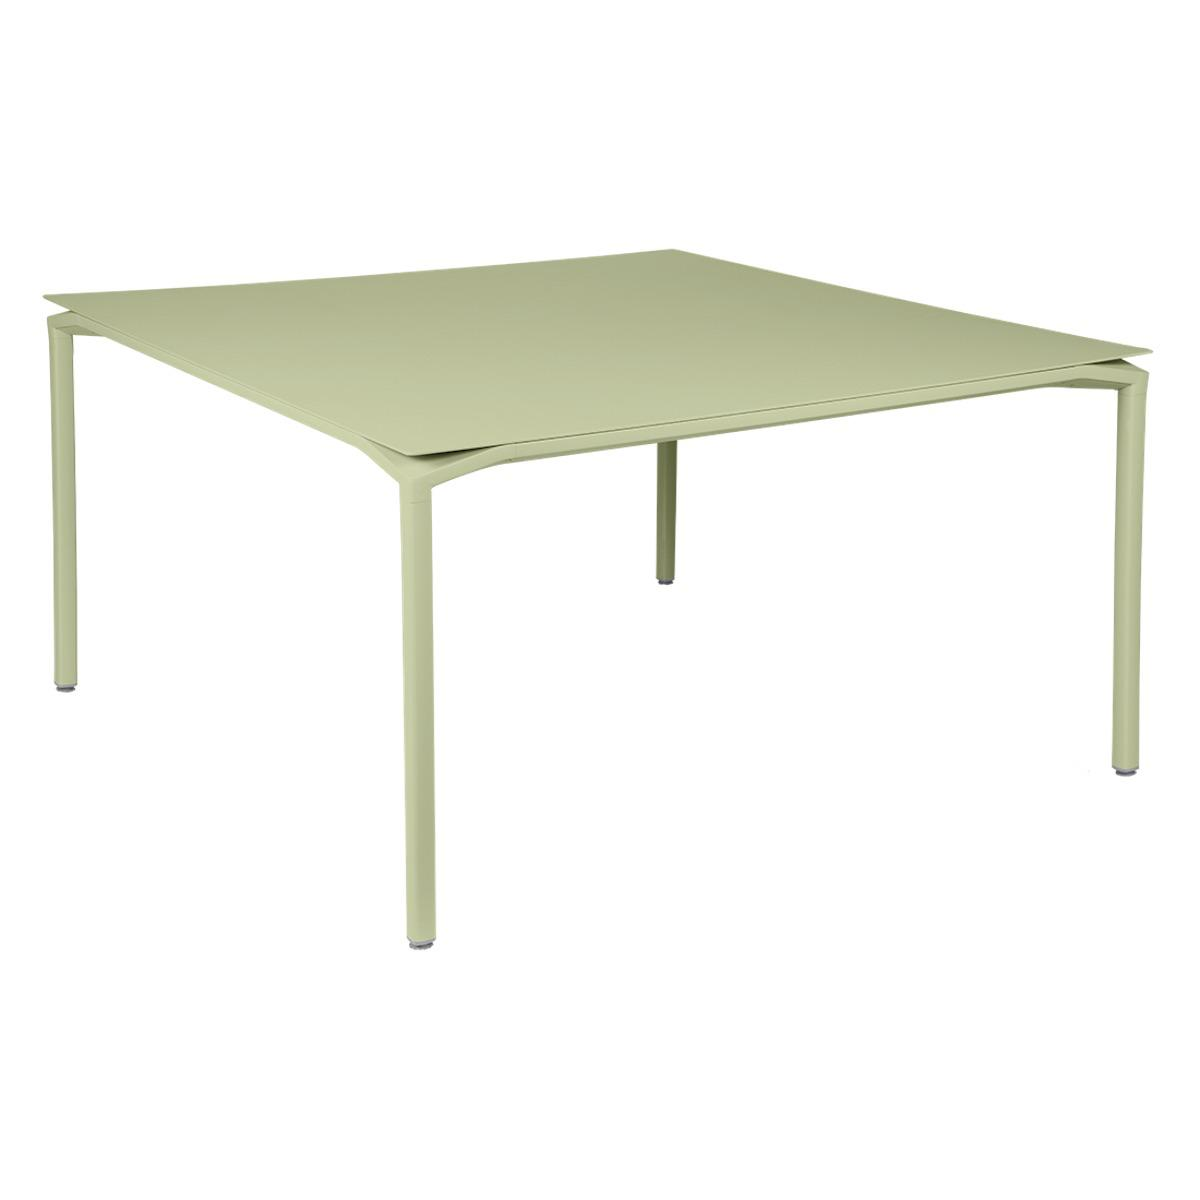 Table 140x140cm CALVI Fermob vert tilleul